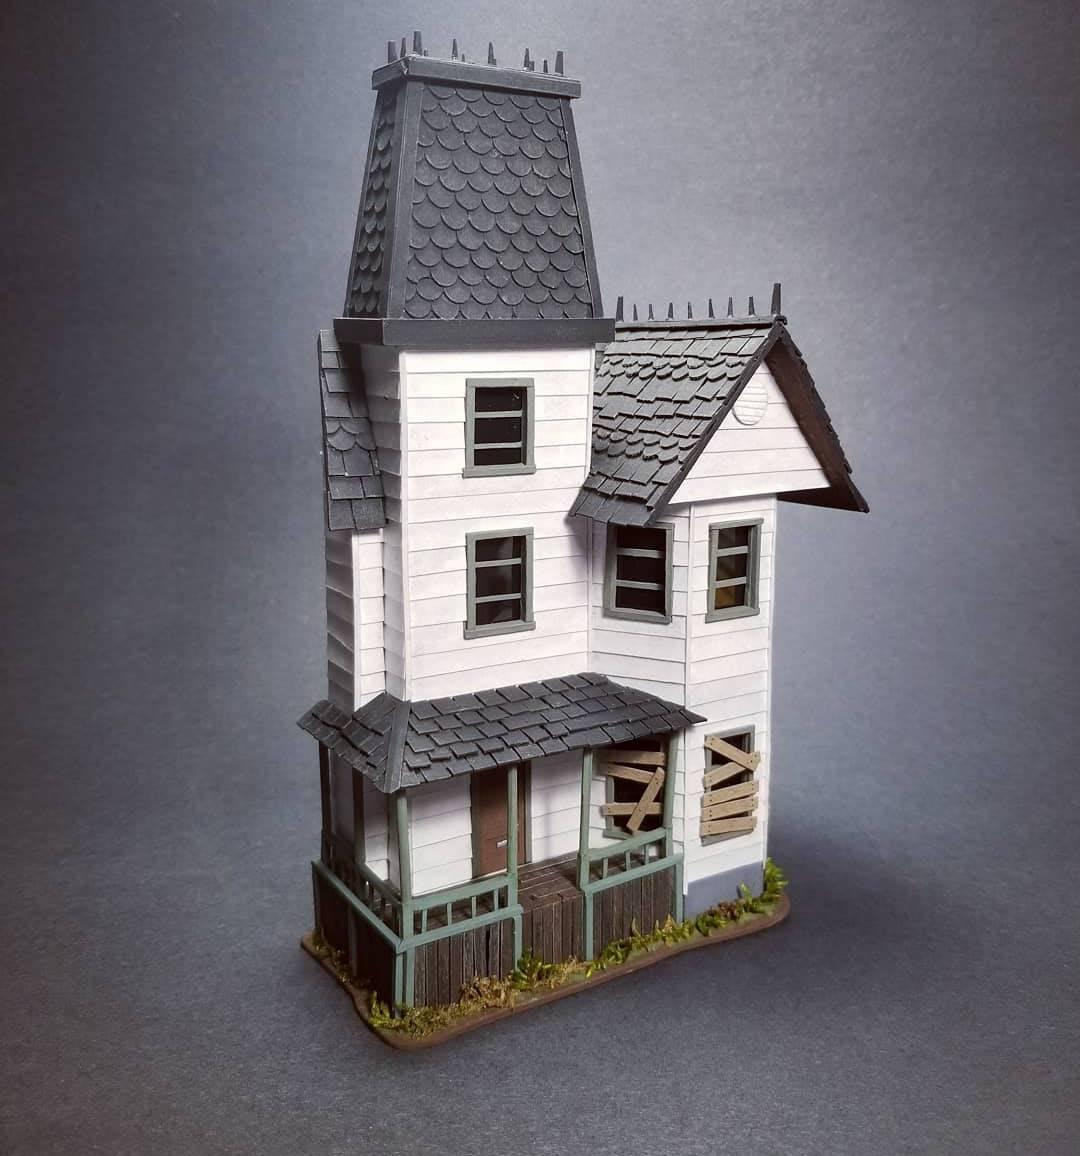 Model Maker Displays A Remarkable Eye For Detail In Making Adorable Miniature Models 2